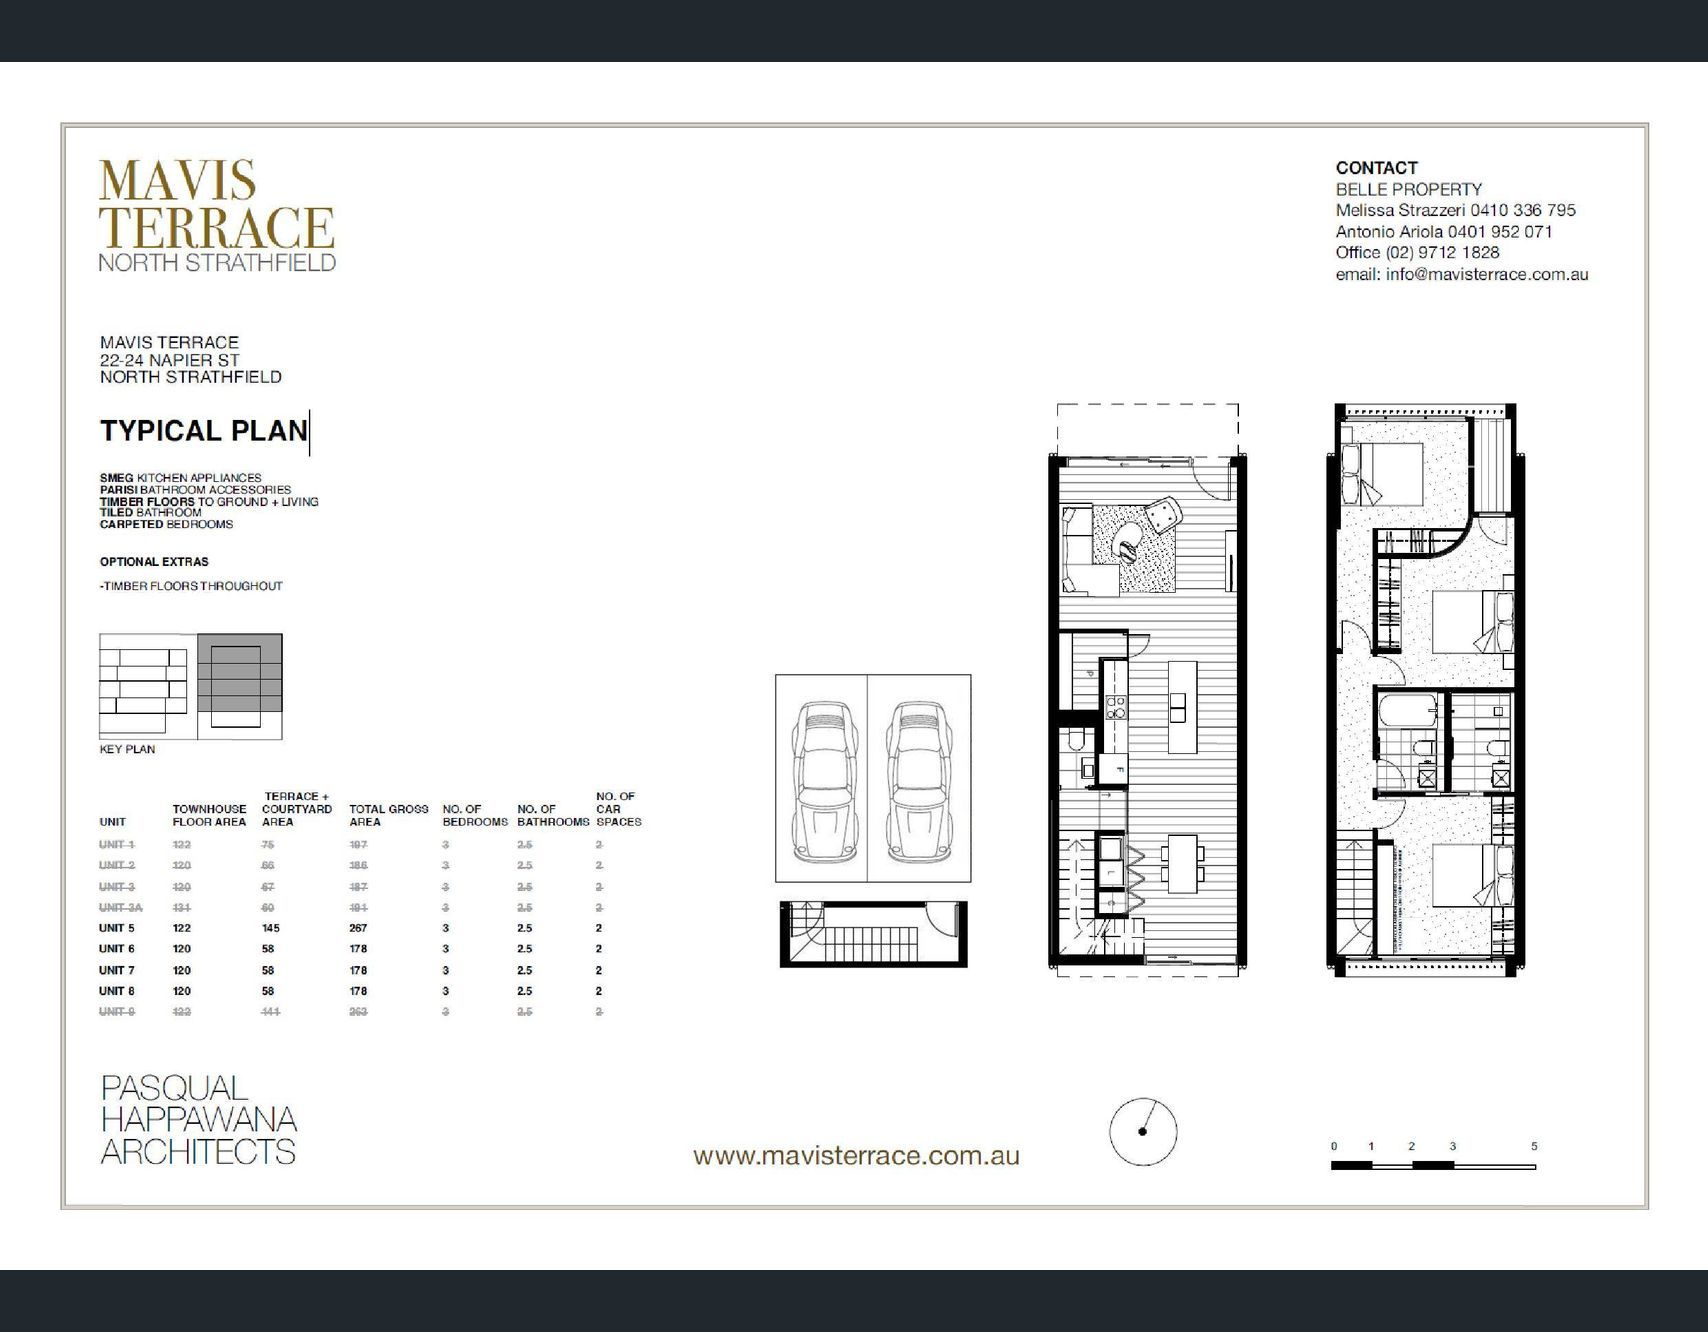 22 24 Napier Street North Strathfield Nsw 2137 Townhouse For Sale Realestate Com Au Em 2020